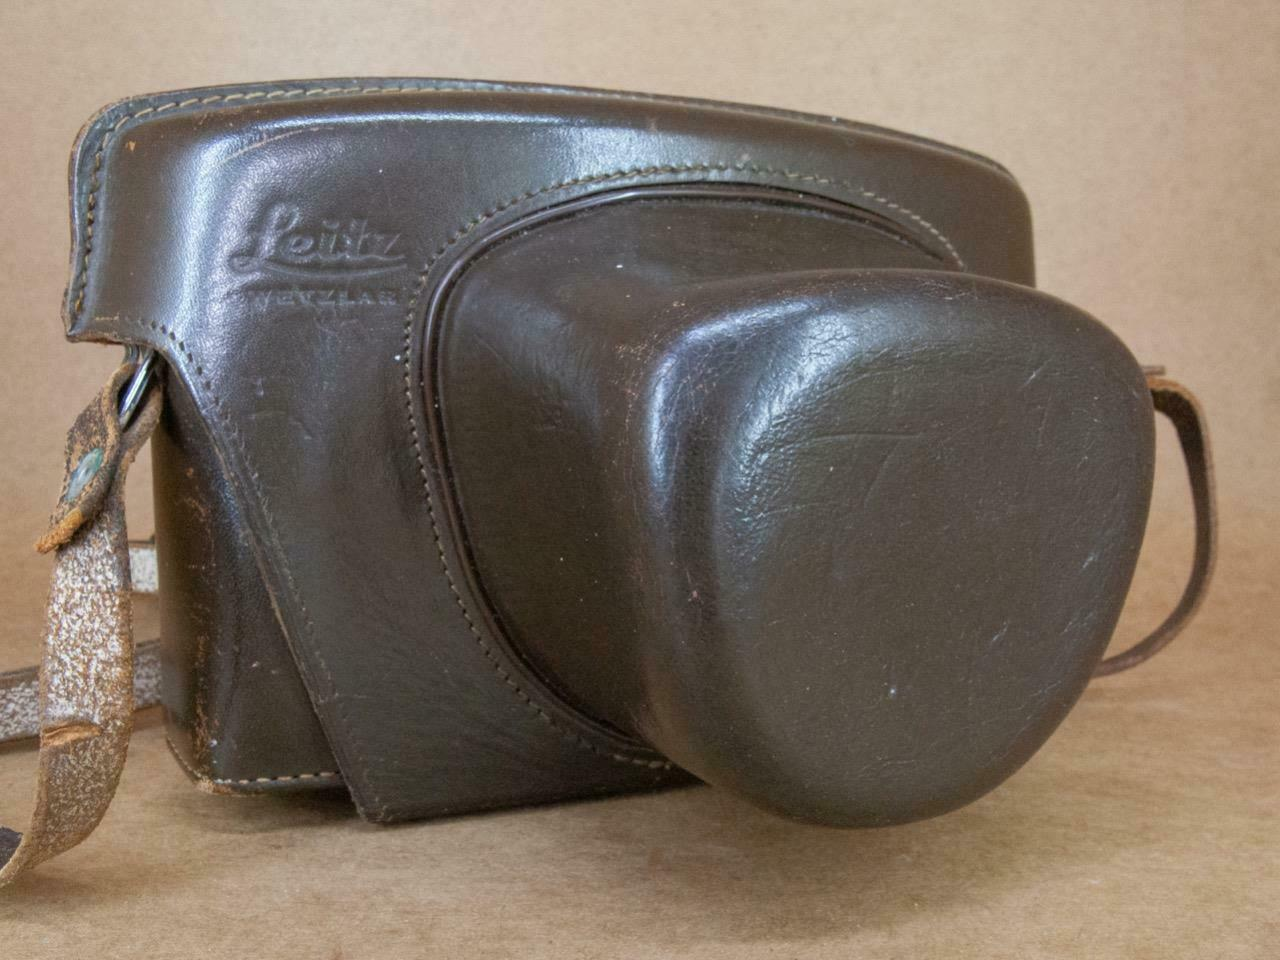 Leitz Leica Leicaflex / SL Brown Leather Ever-Ready Case